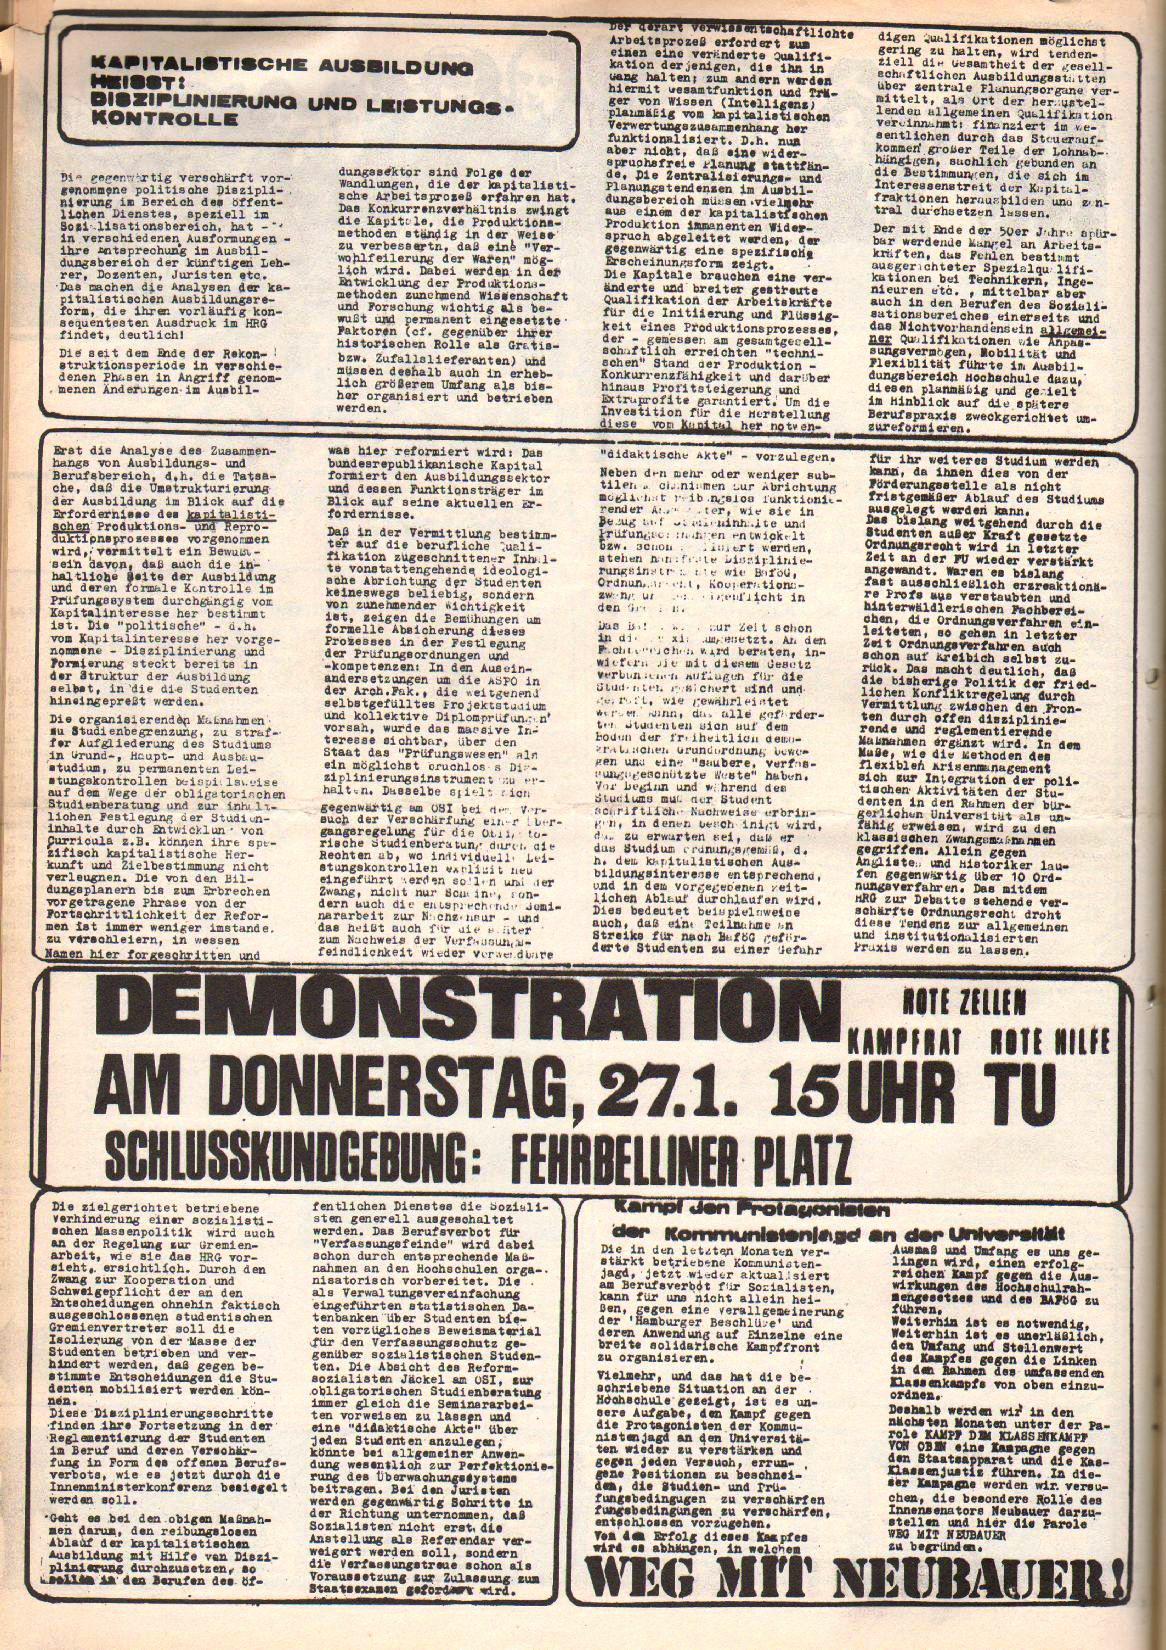 Berlin_Hochschulkampf_1971_23_14